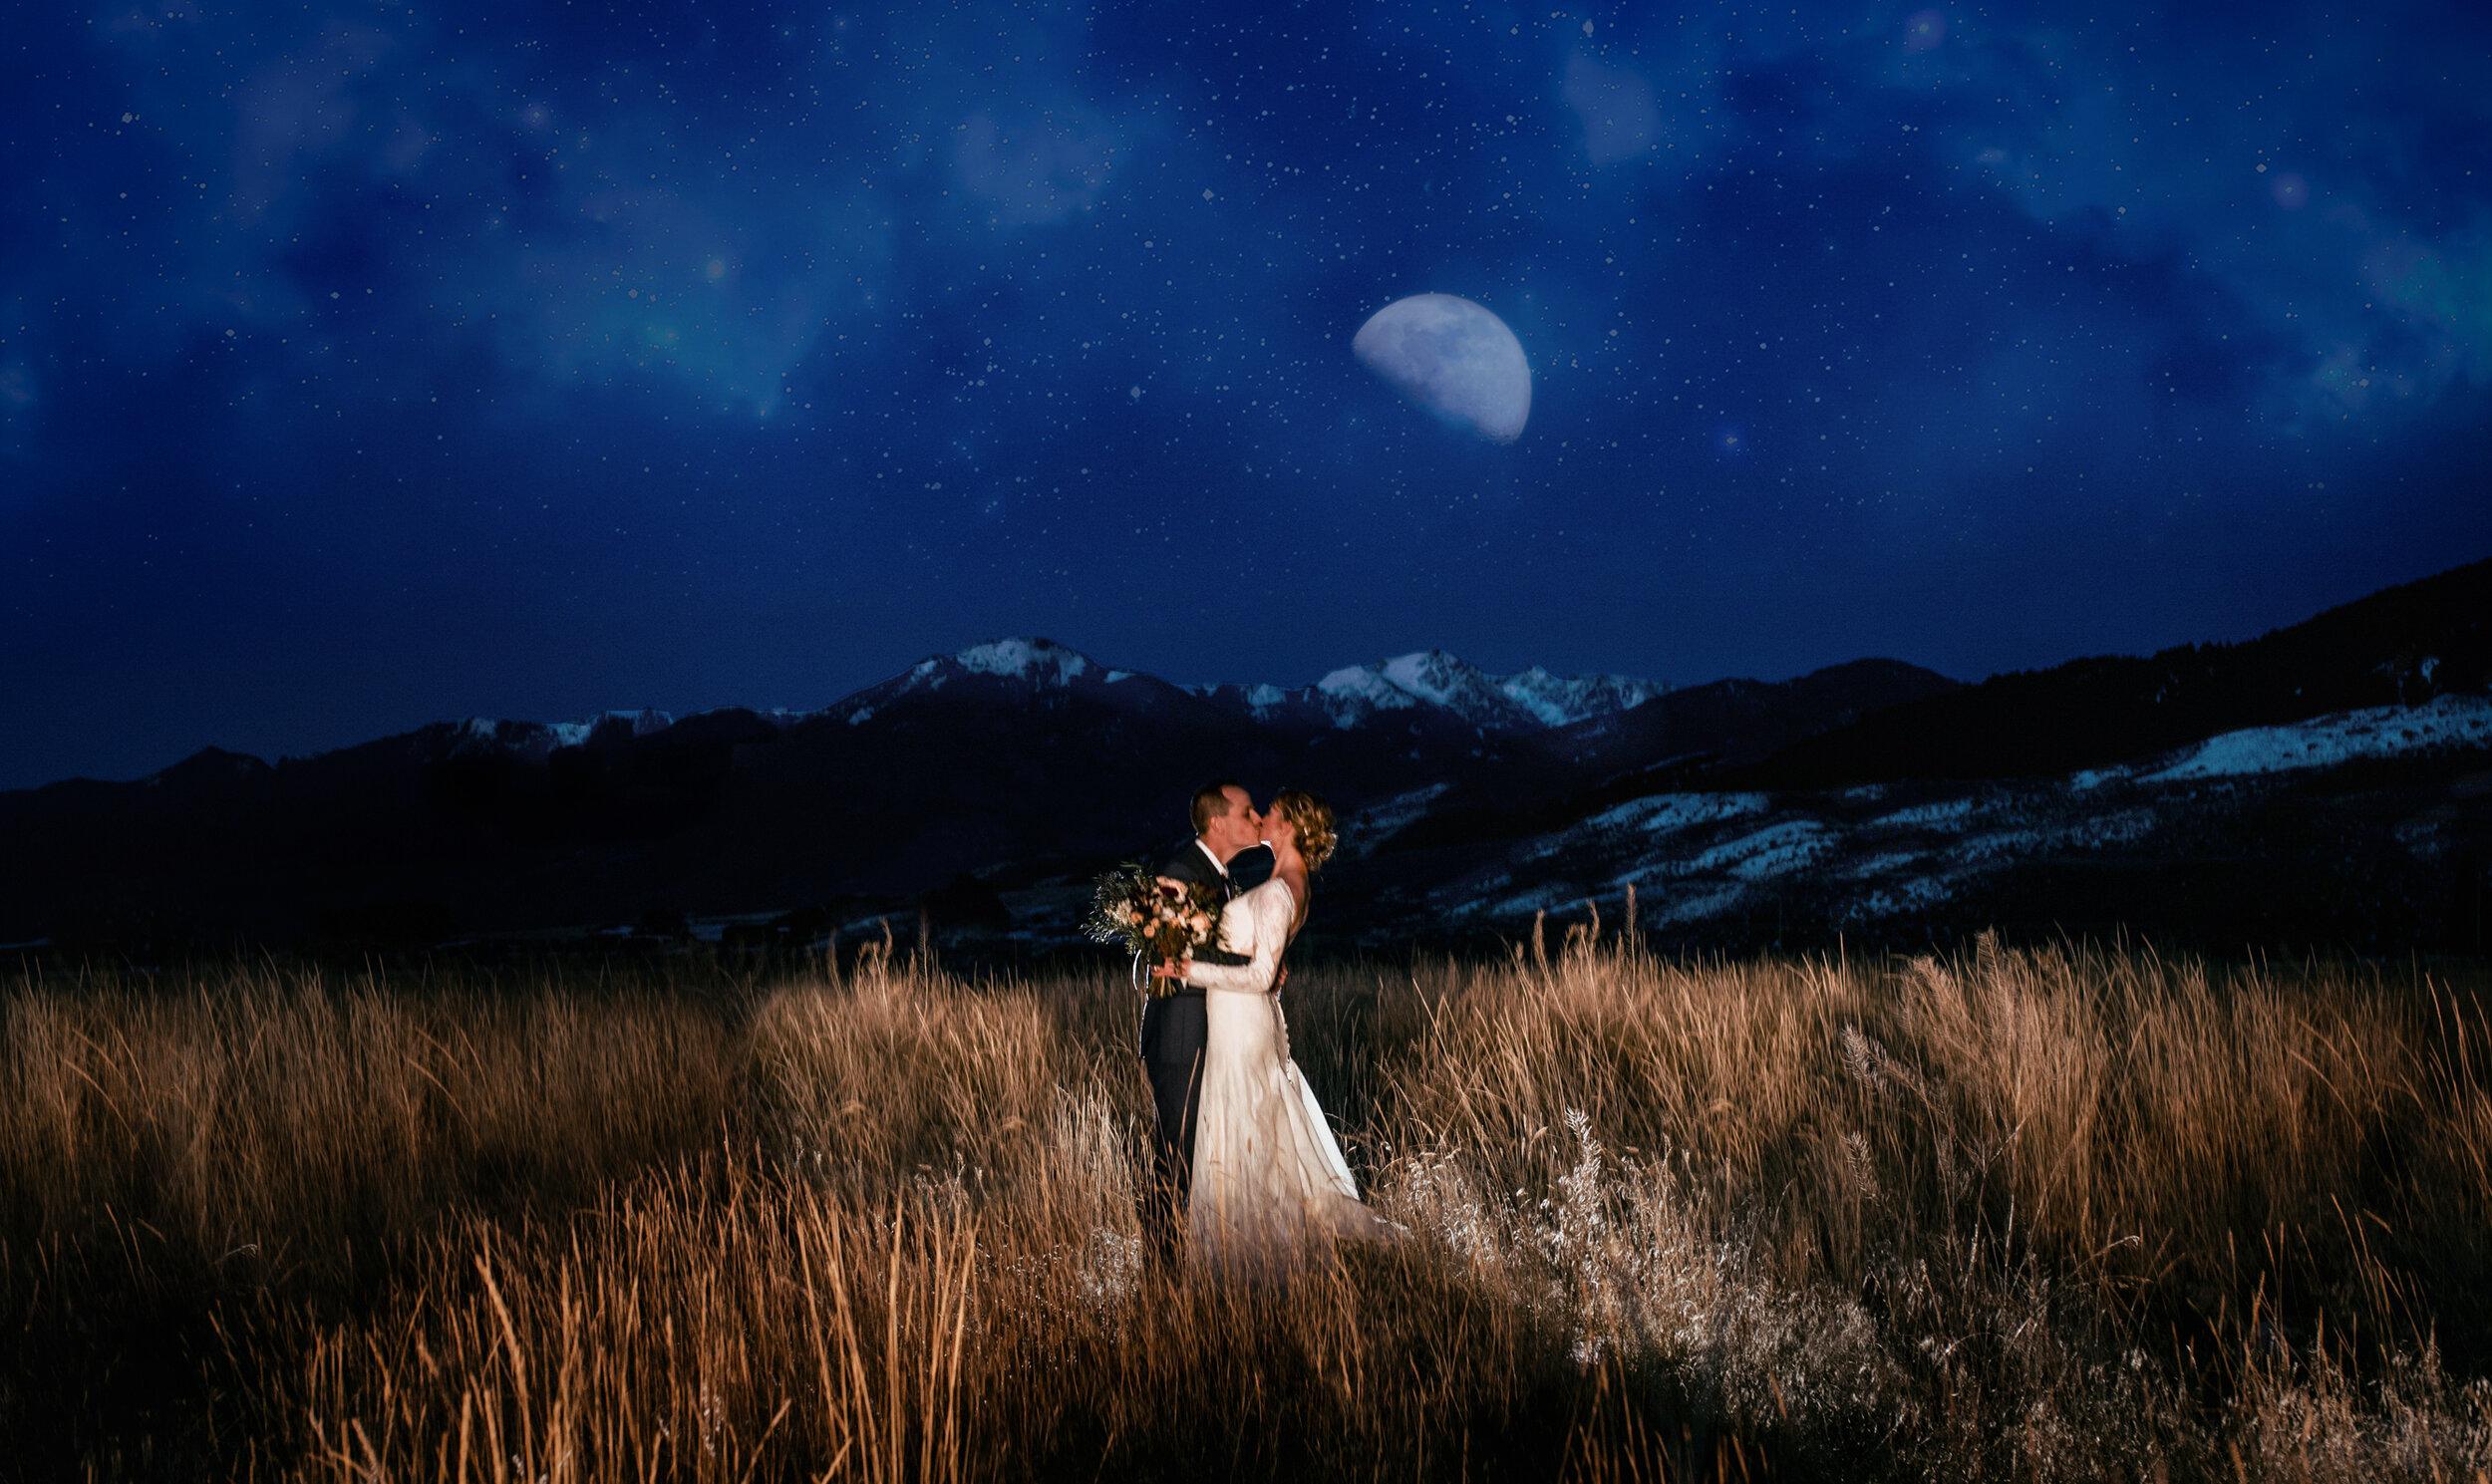 001Chico Hot Springs Wedding_Montana Wedding Photographer_Winter Wedding_Ariel & Richard_October 12, 2019-1843_full moon.jpg